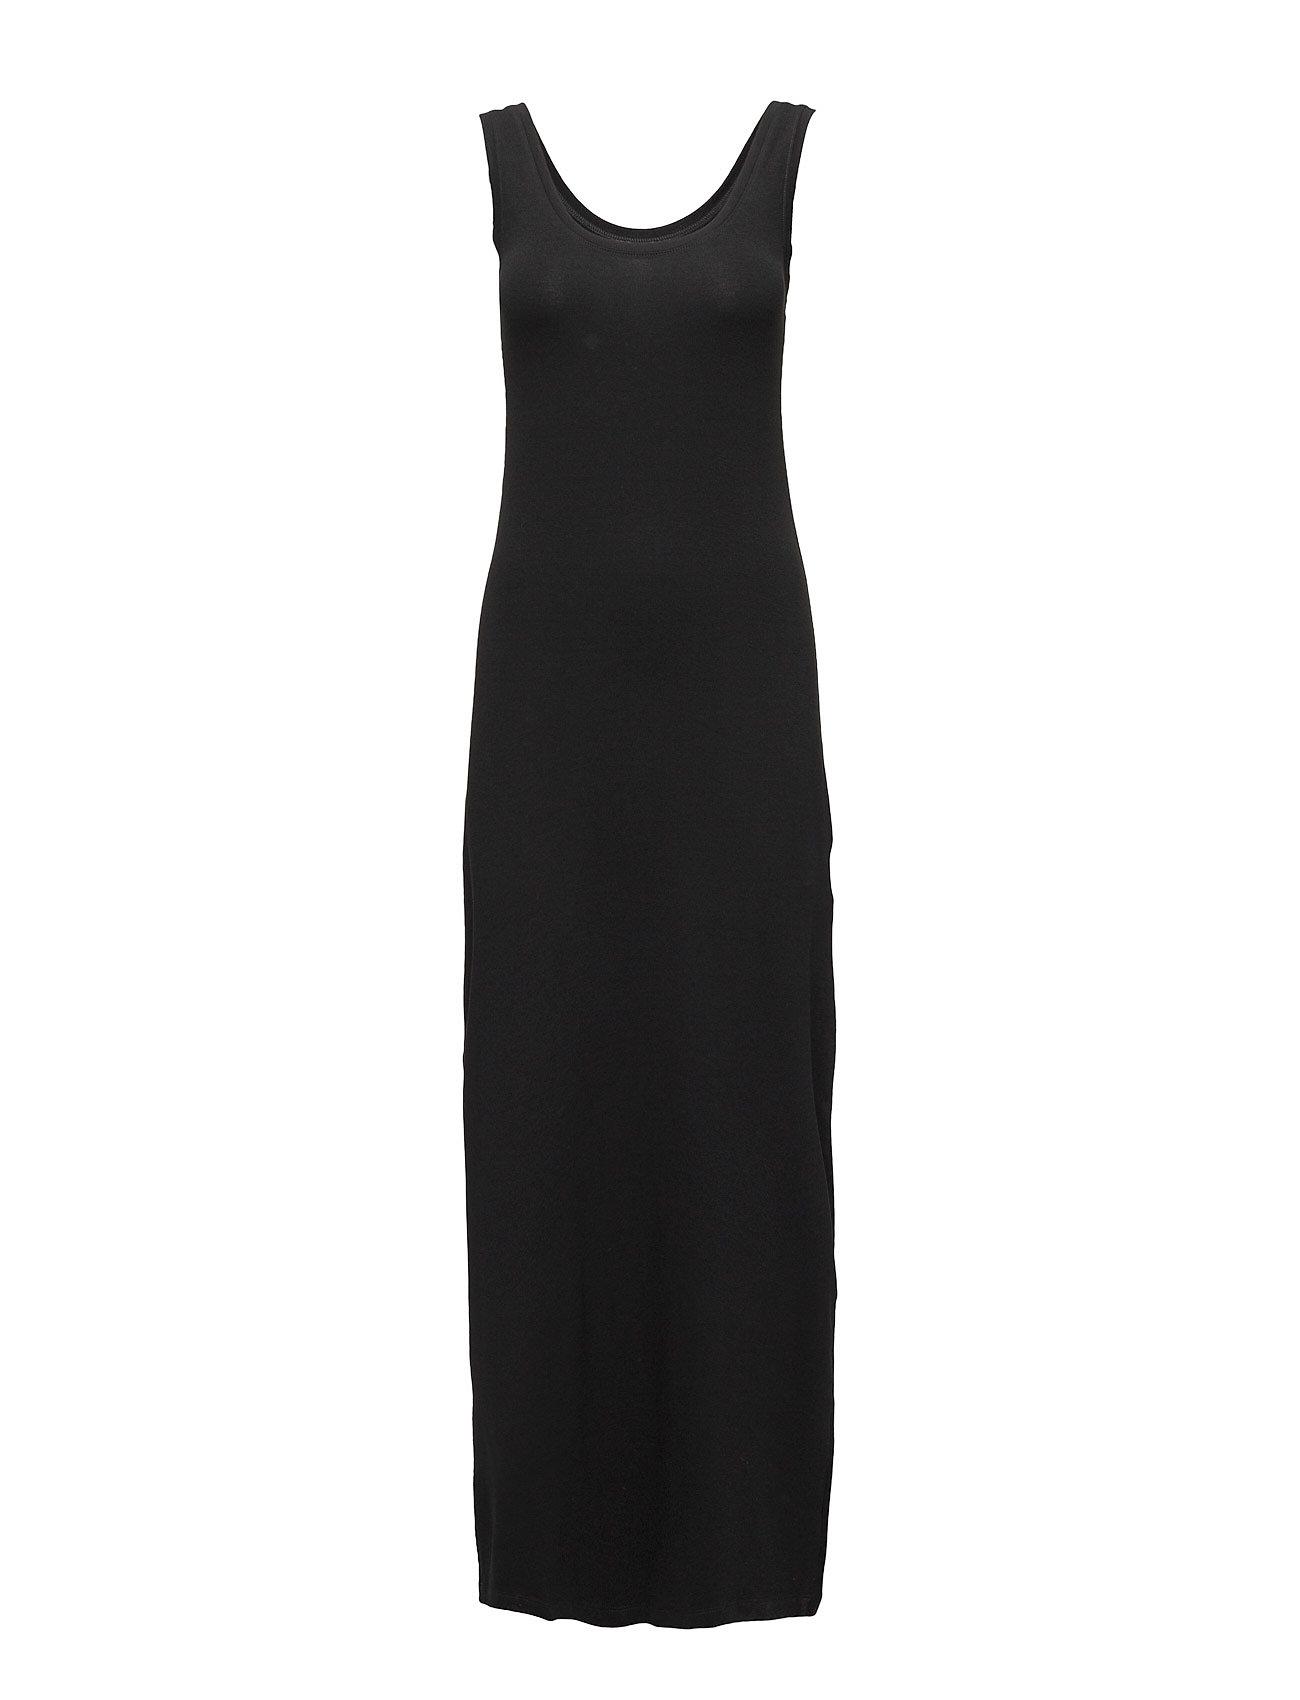 Vihonesty New Maxi Dress-Noos Vila Maxi Kjoler til Damer i Sort